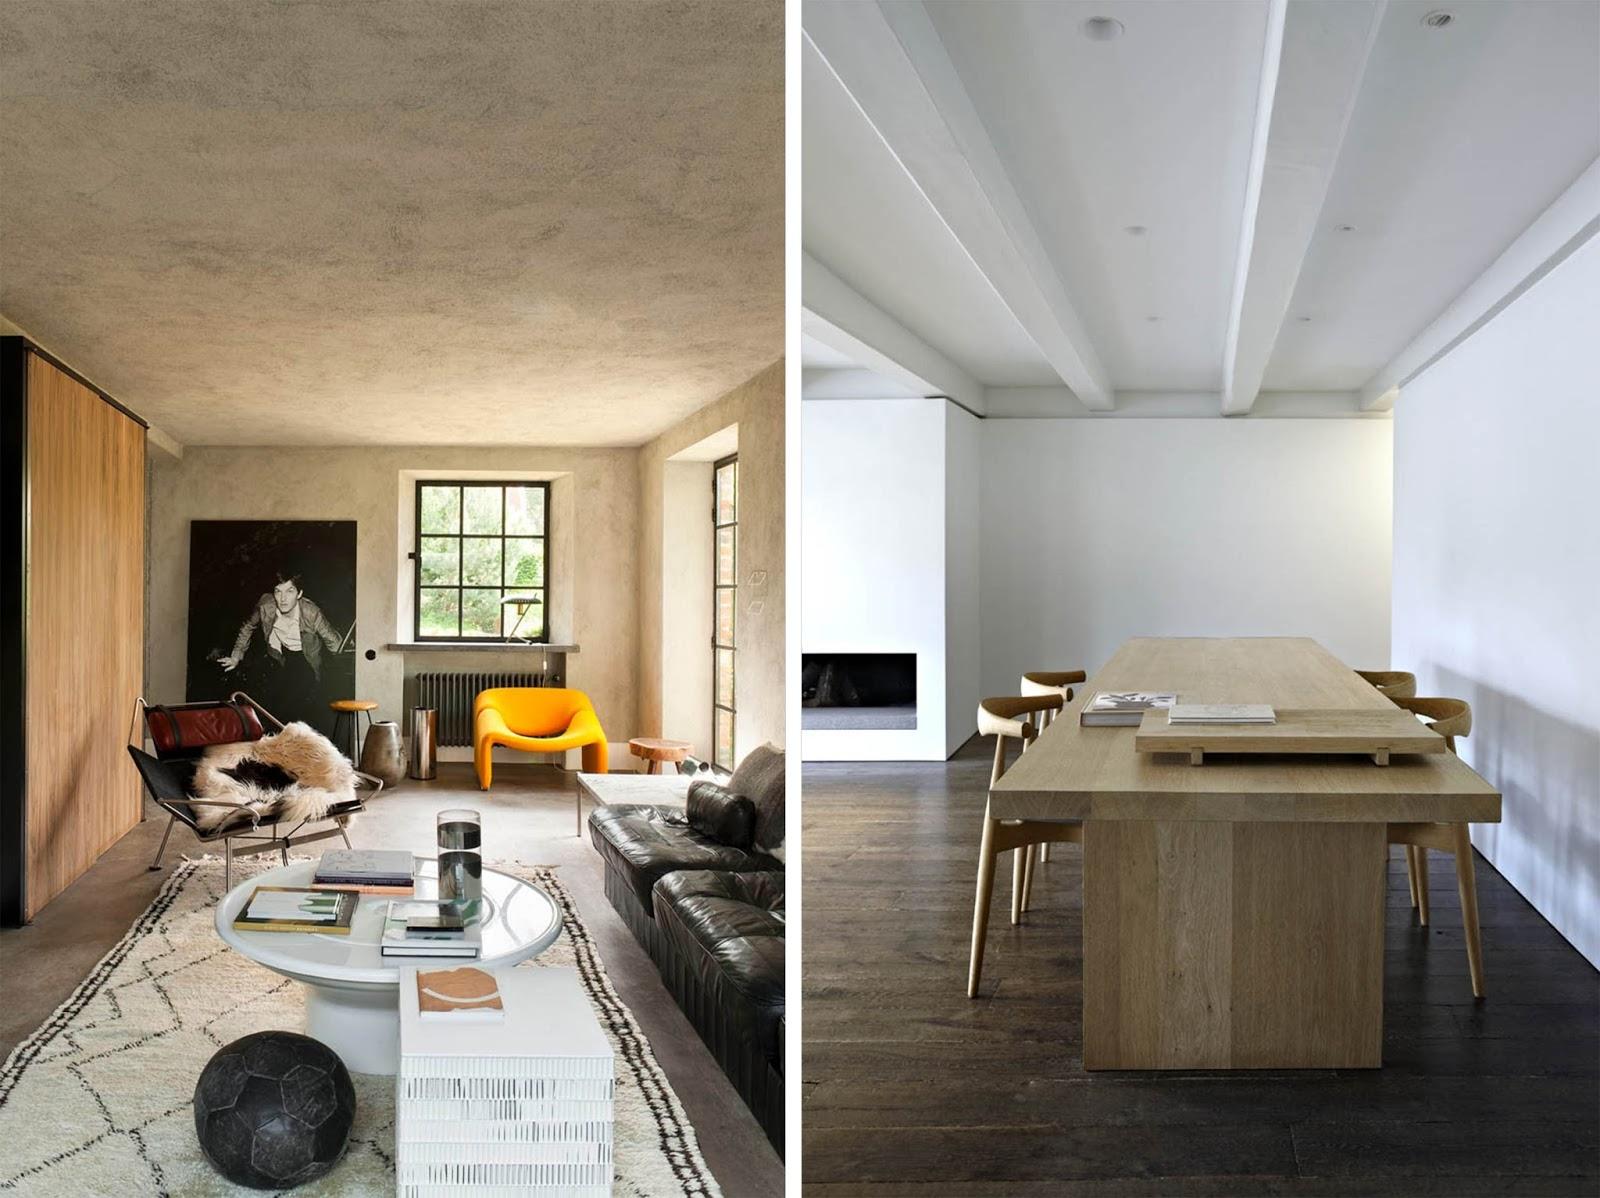 Marc heldens 25 anni di fotografie di interni arc art for Arredamento di interni